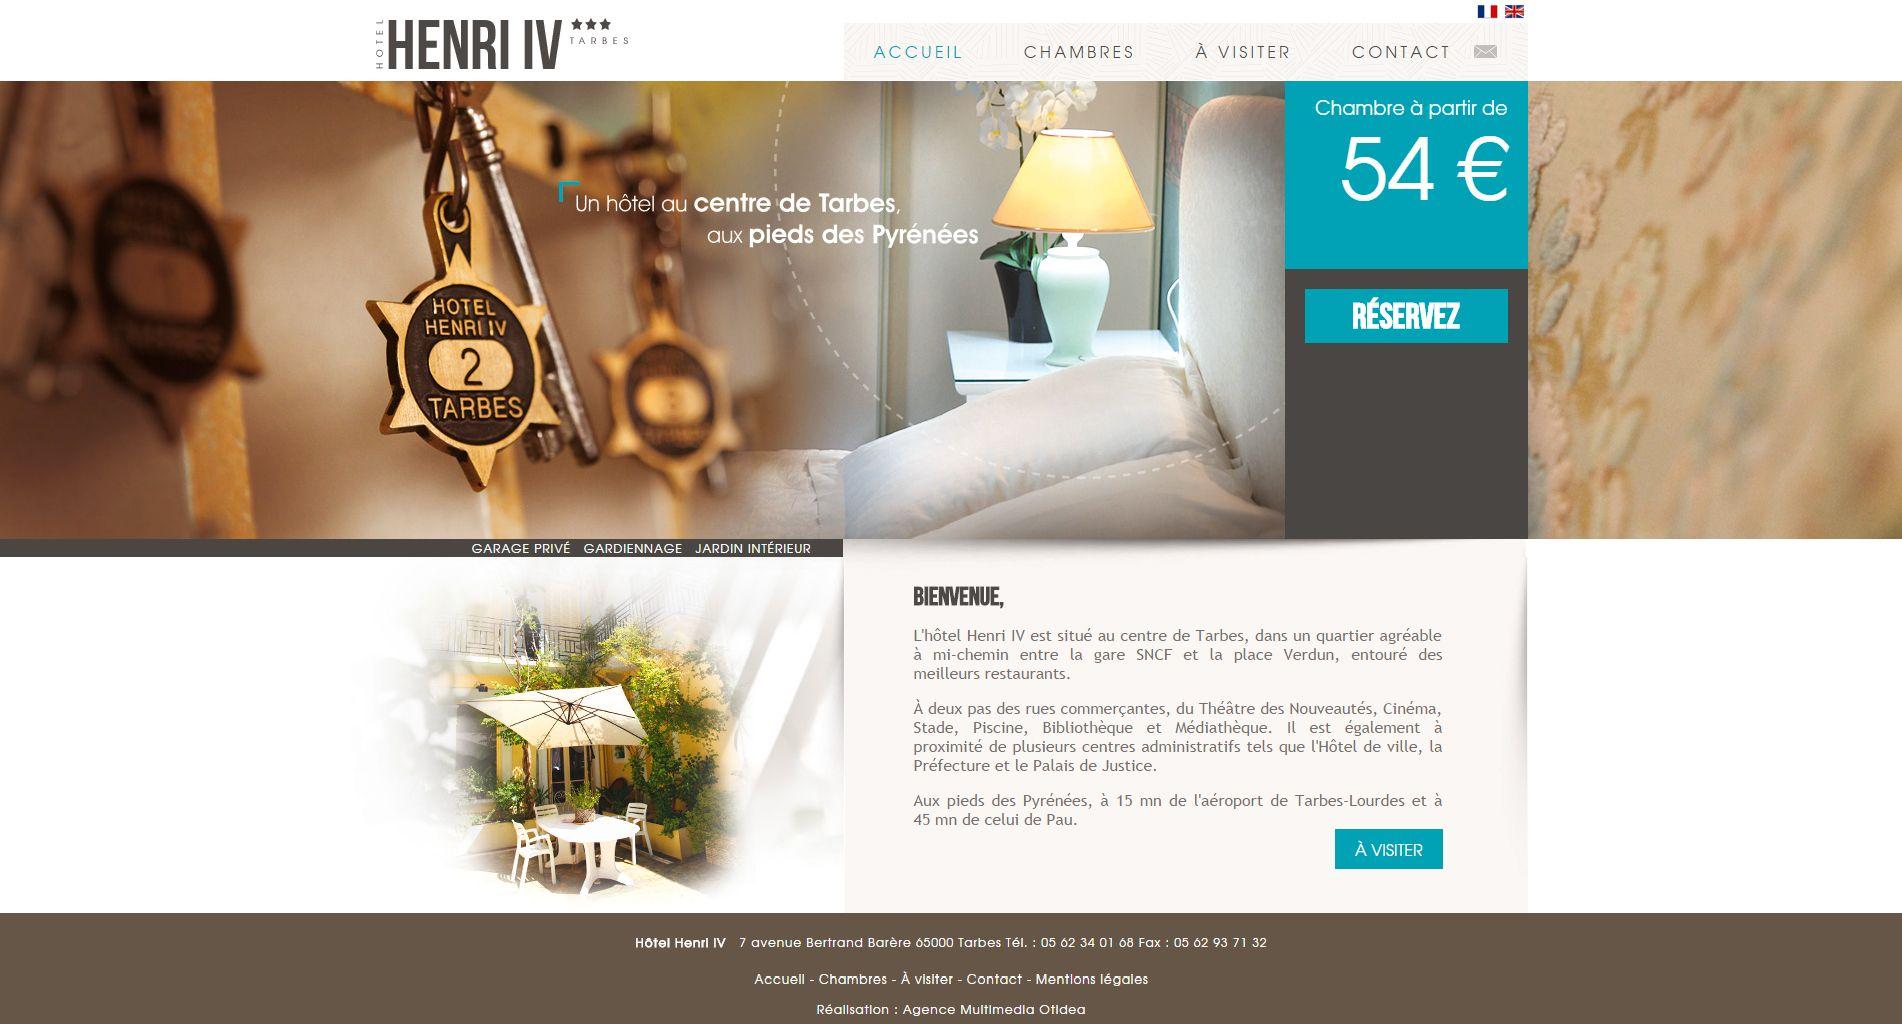 Site Internet De L Hotel Henri Iv A Tarbes Hautes Pyrenees 65 Application Facebook